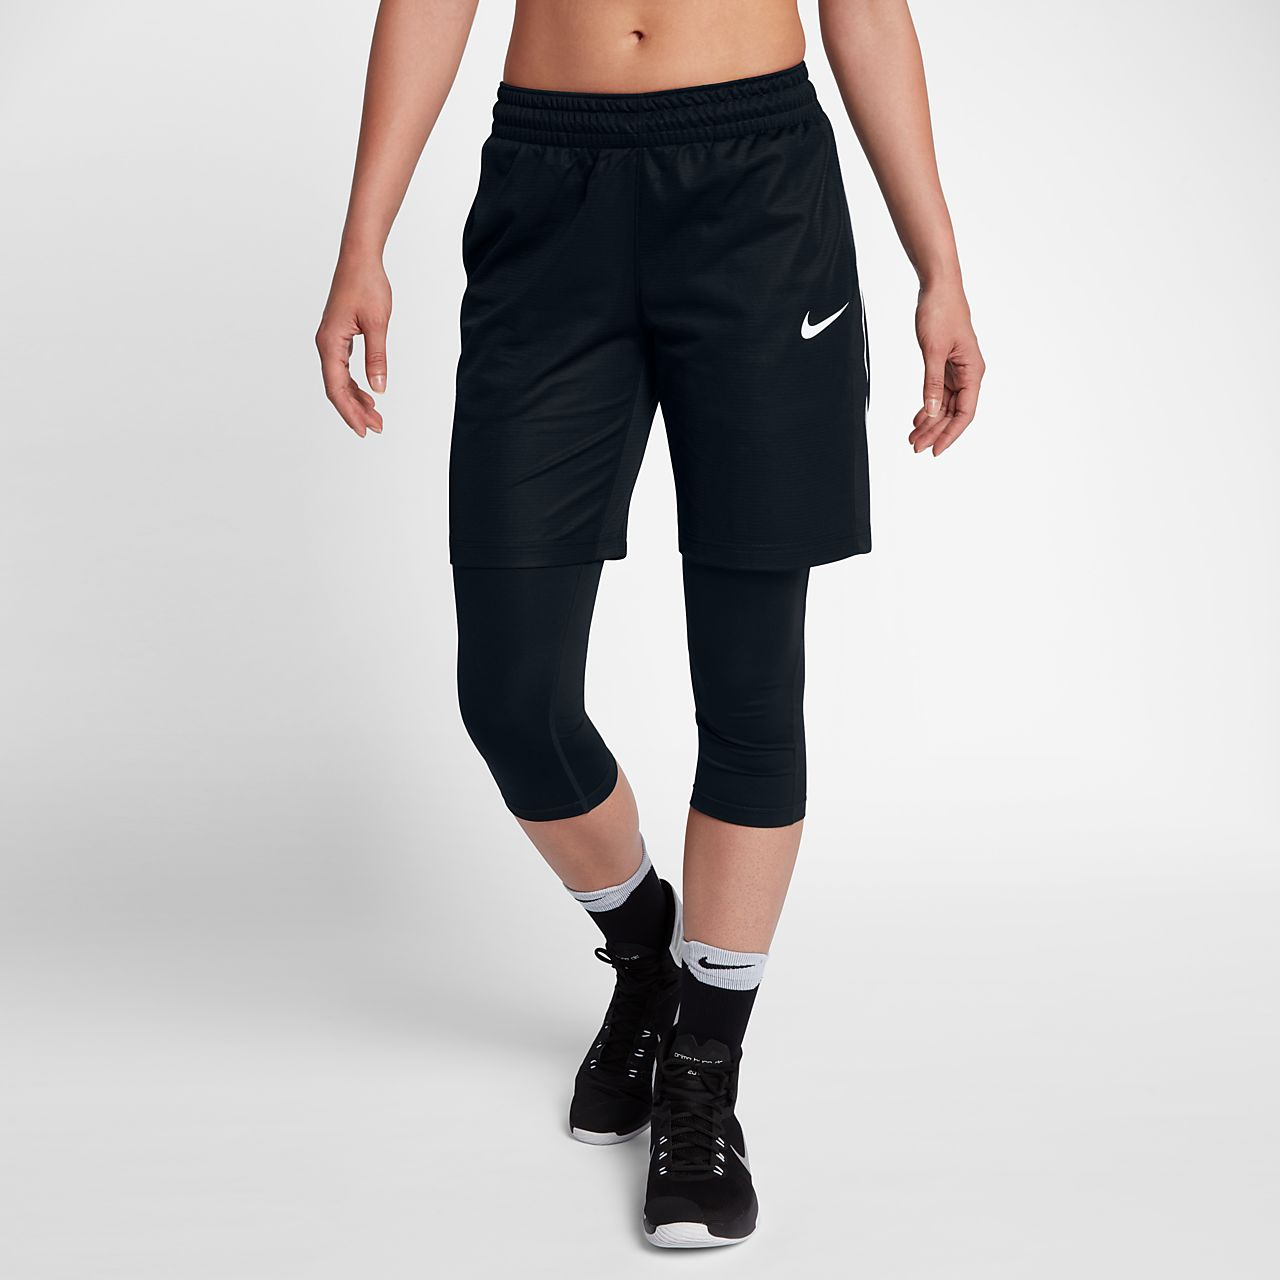 74f78421de10 Nike Dry Essential Women s 10